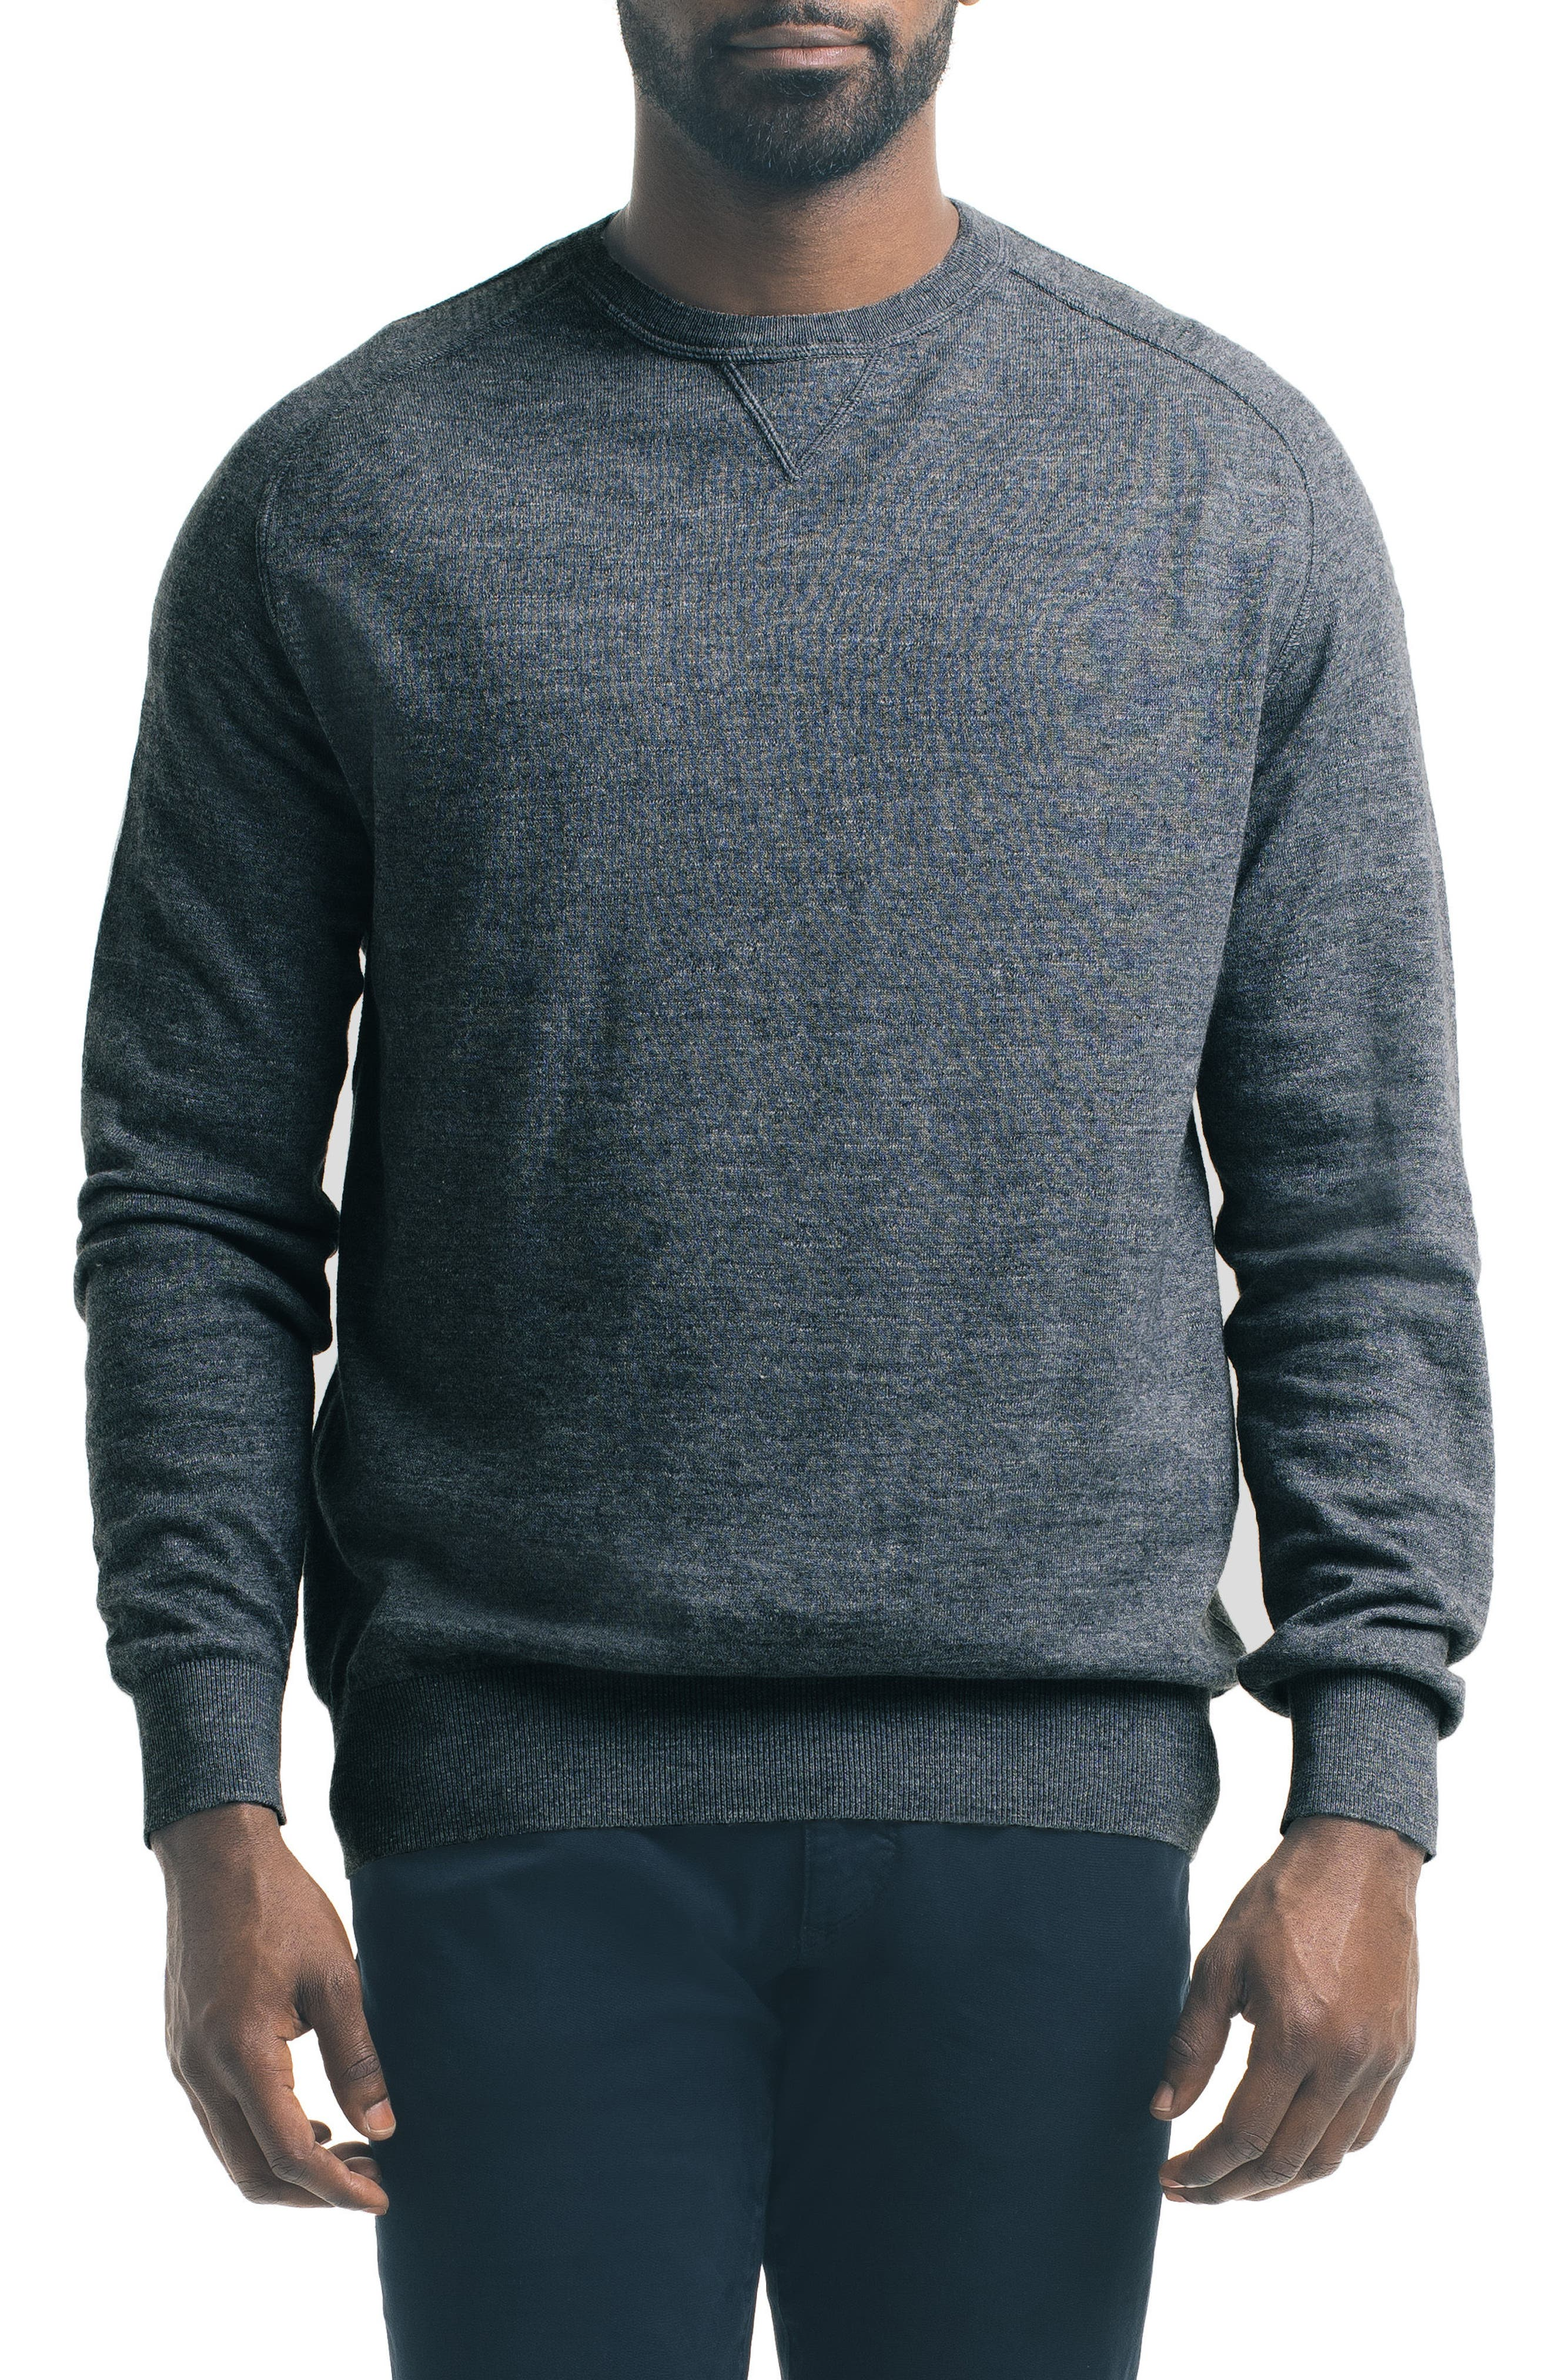 Alternate Image 1 Selected - Good Man Brand Slub Pullover Sweater